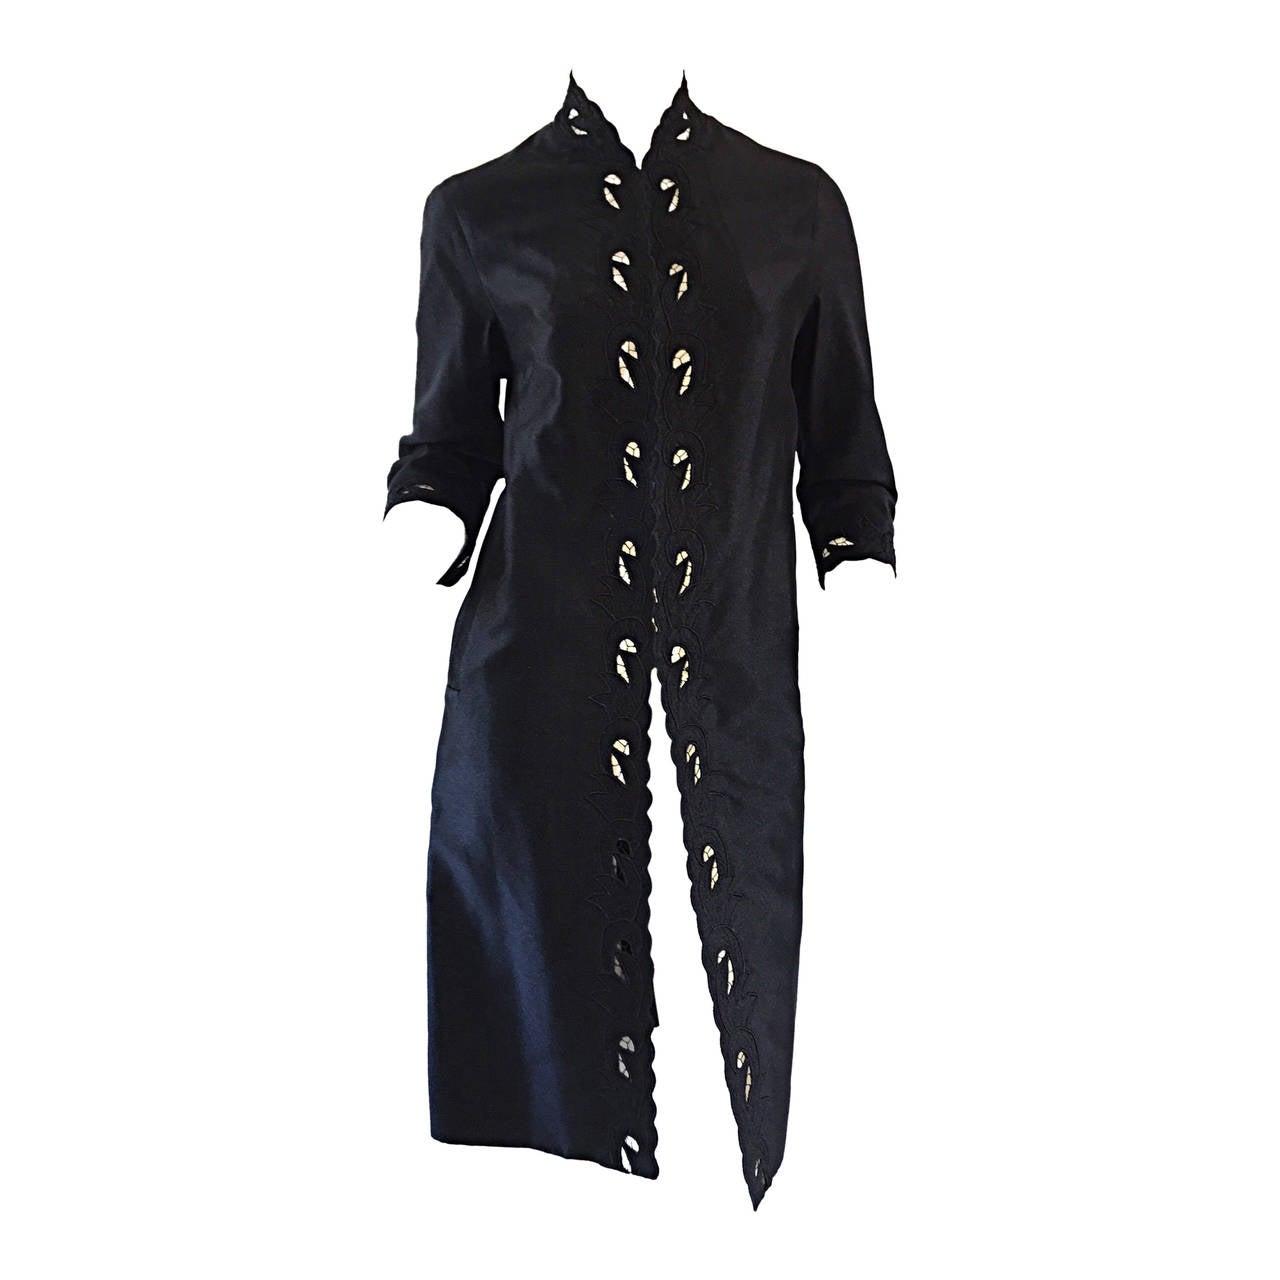 Chic 1940s Black Duster / Opera Jacket w/ Crochet Details + Scalloped Edges 1